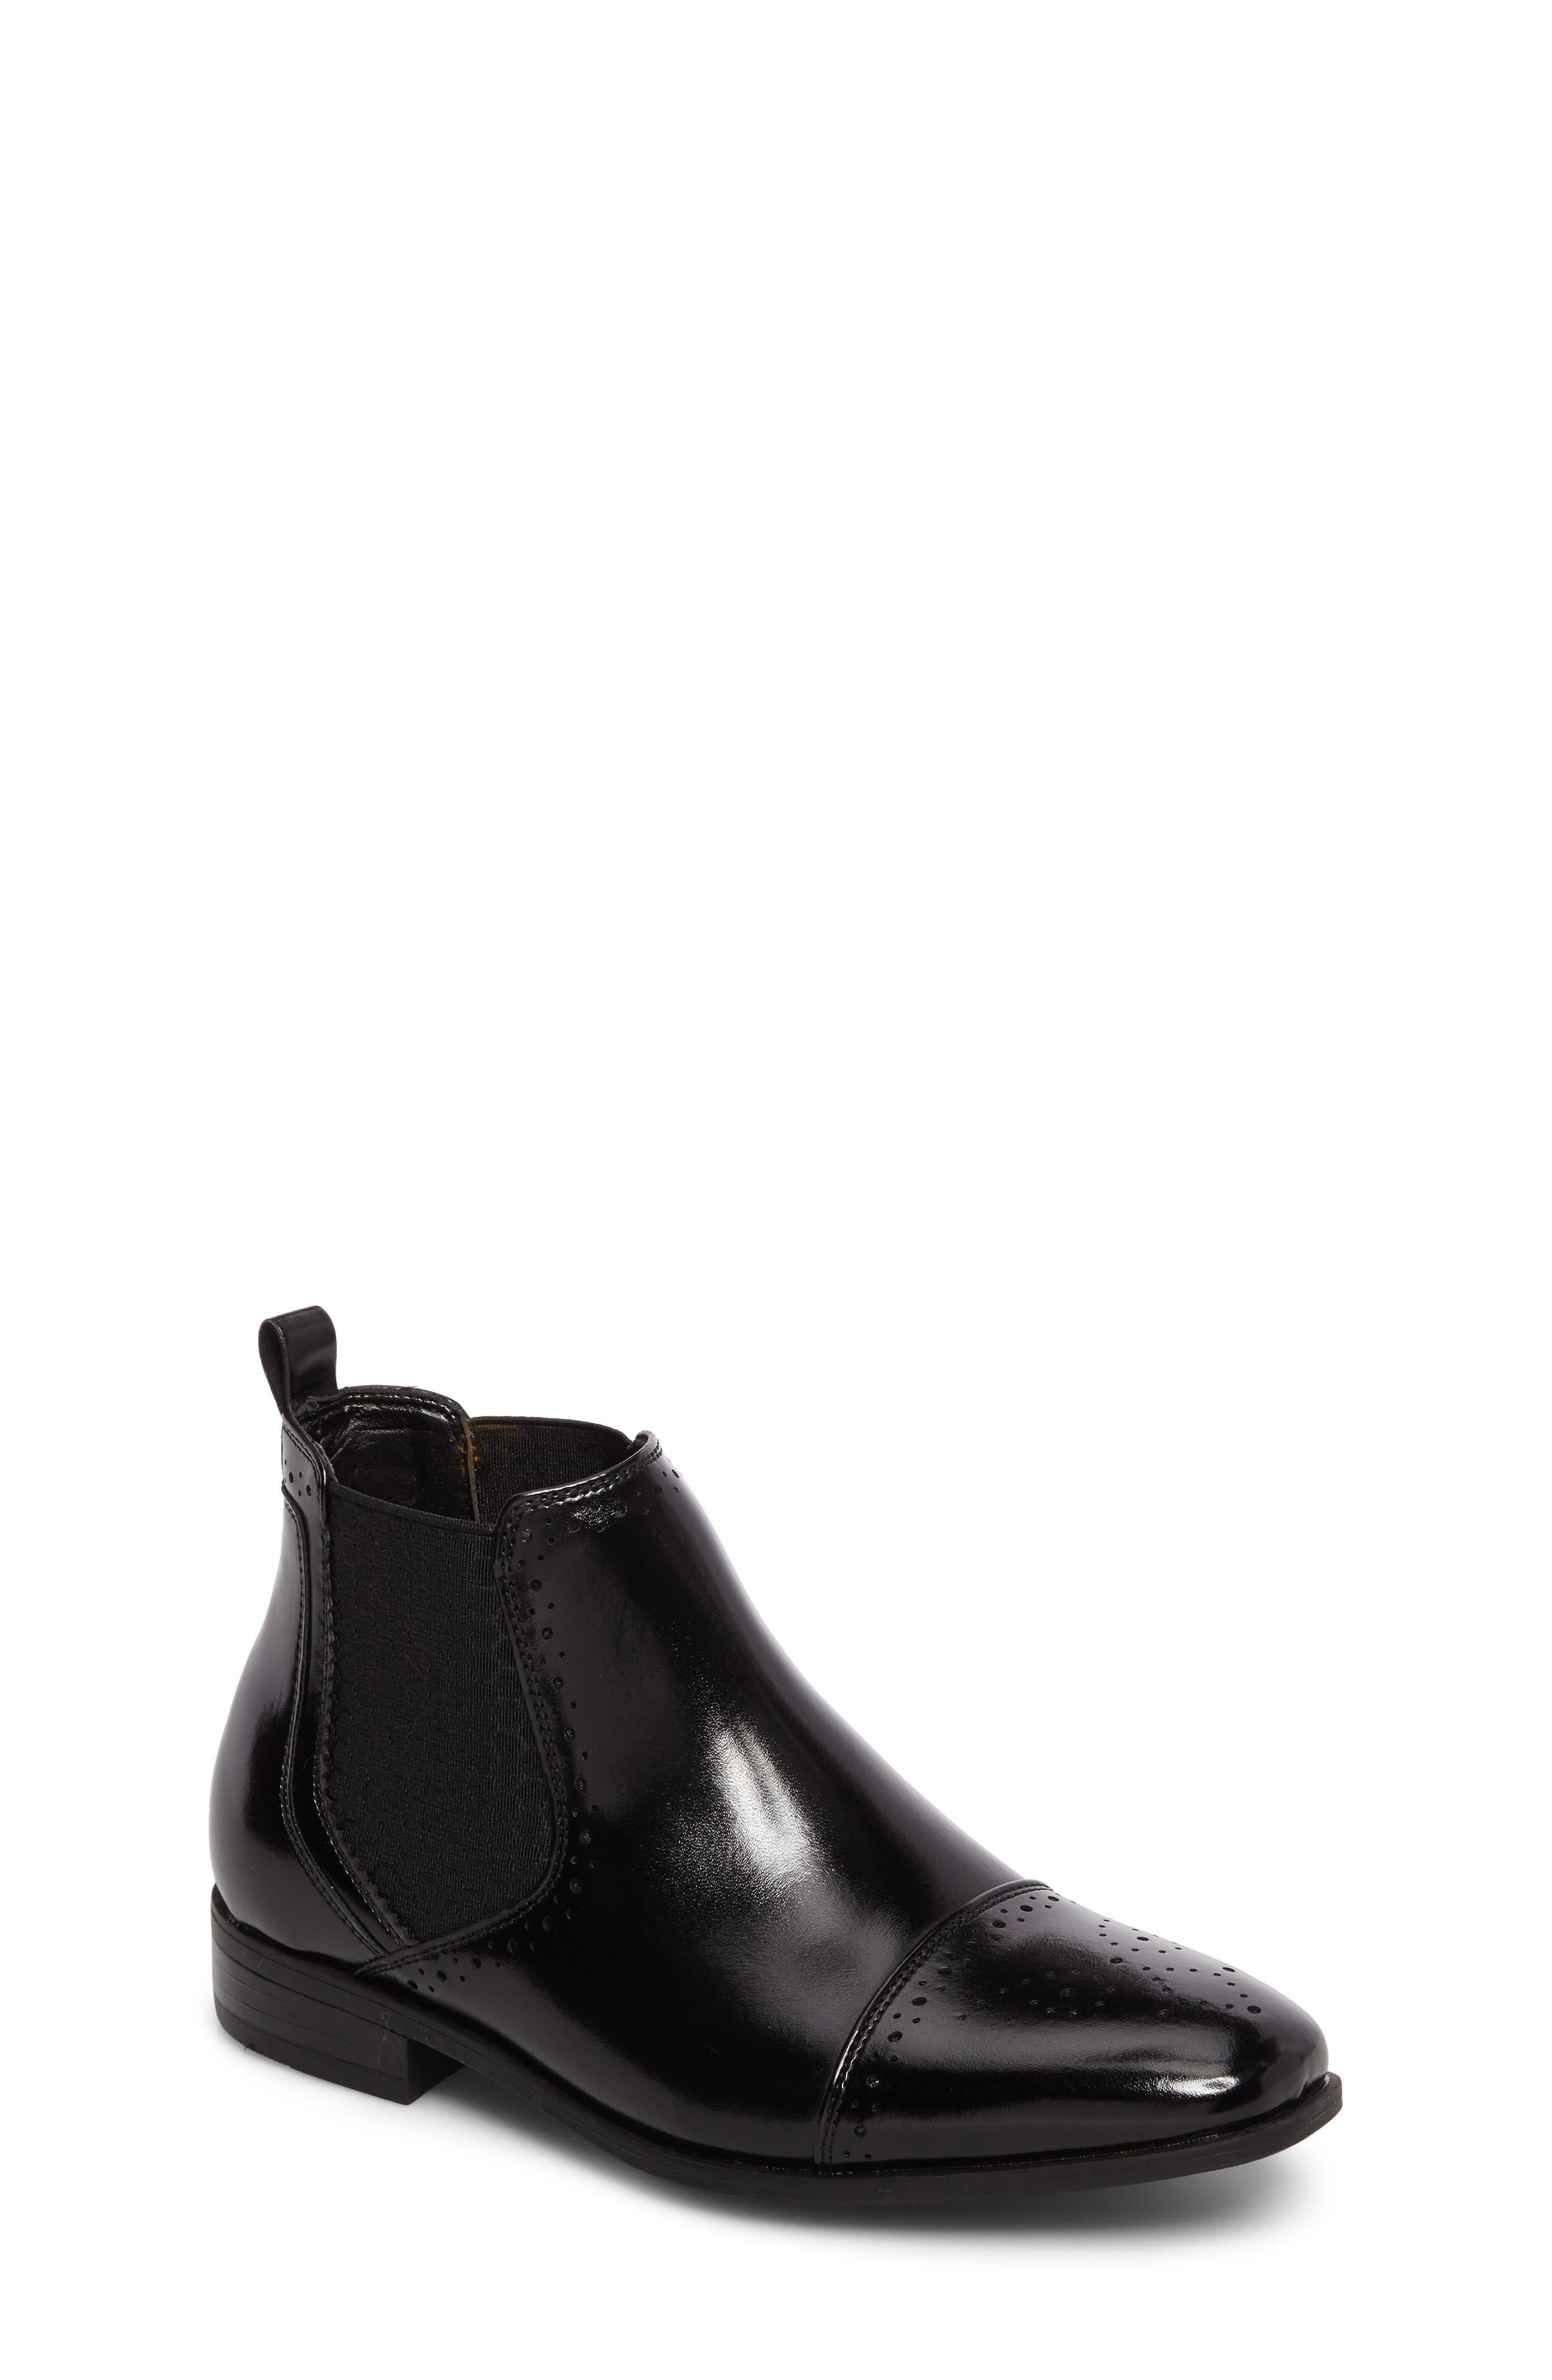 Alomar Cap Toe Chelsea Boot,                         Main,                         color,